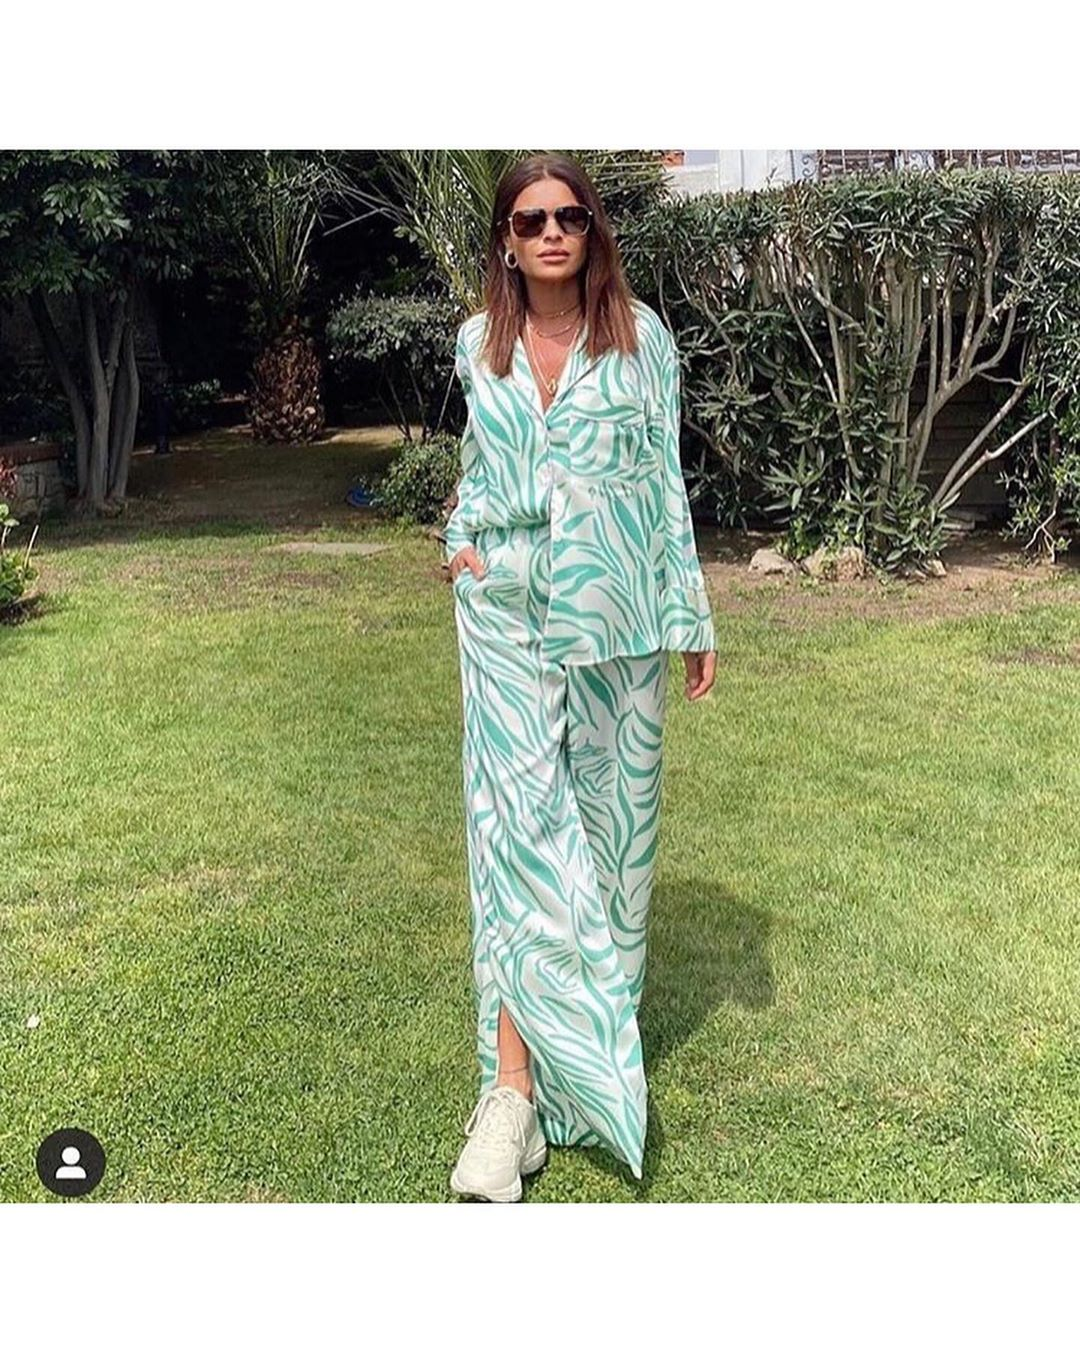 printed pyjama type shirt de Zara sur look_by_zara_hm